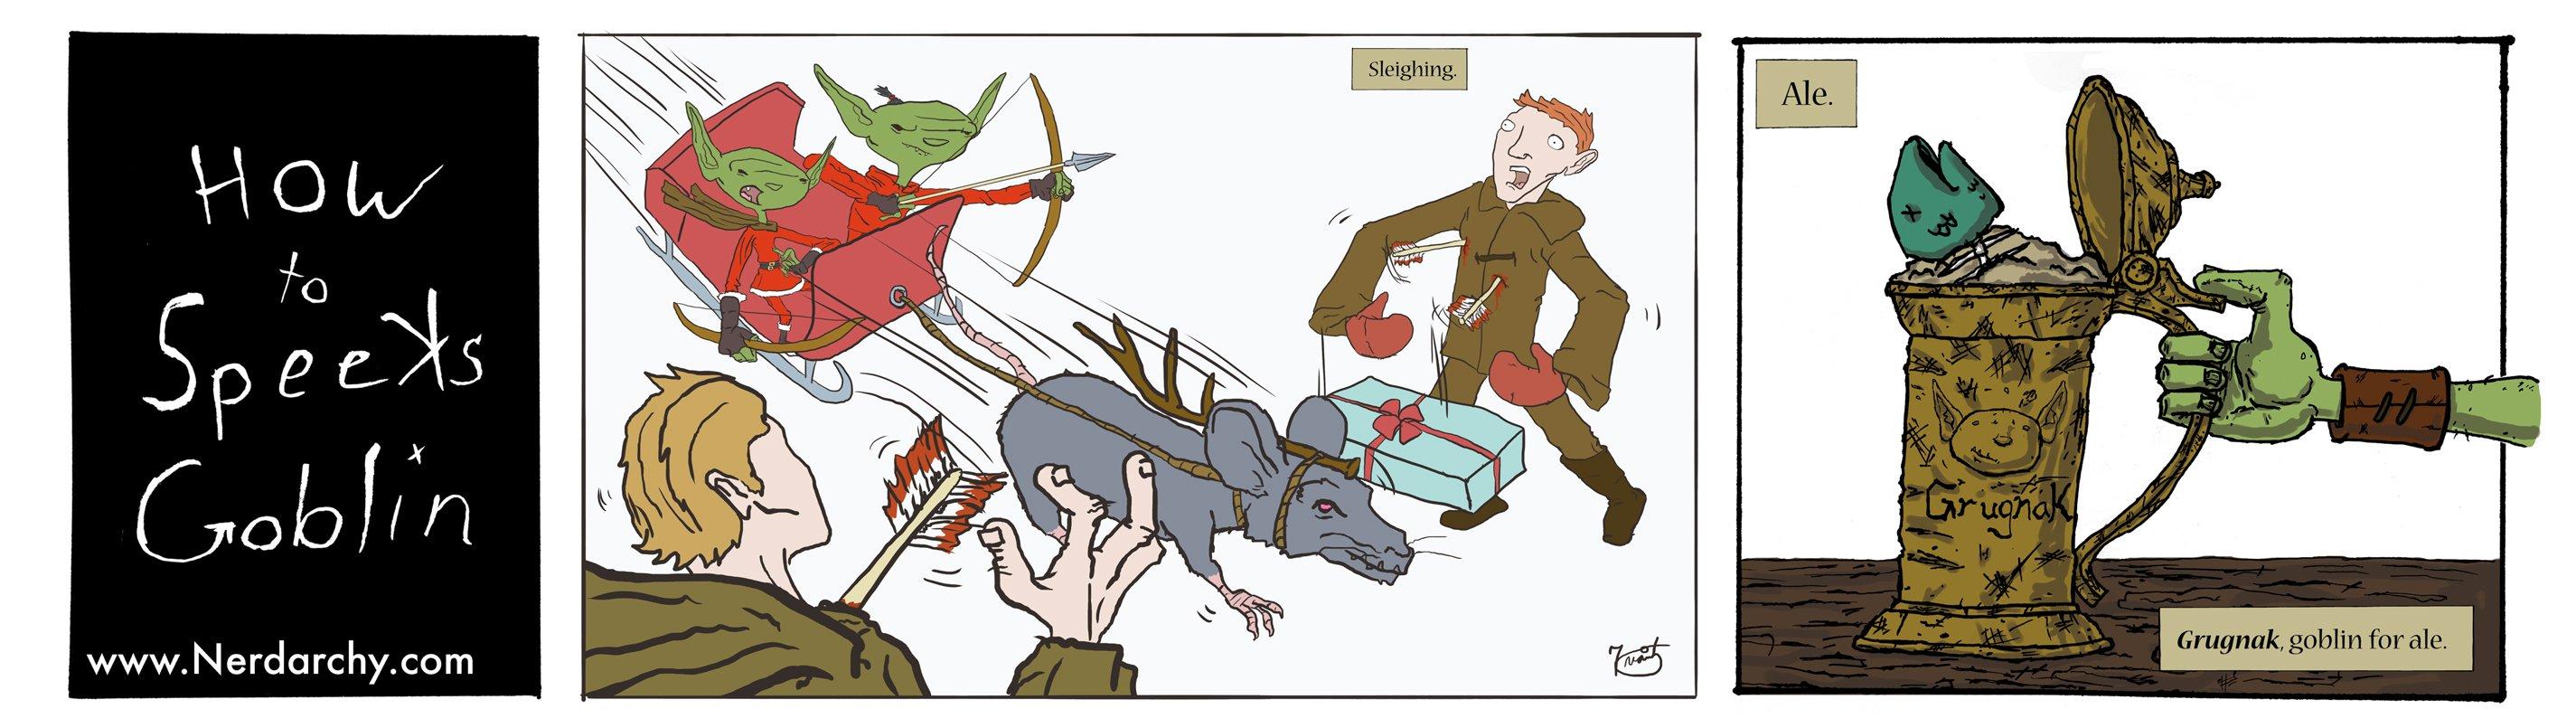 How to Speeks Goblin Goblins Sleighing